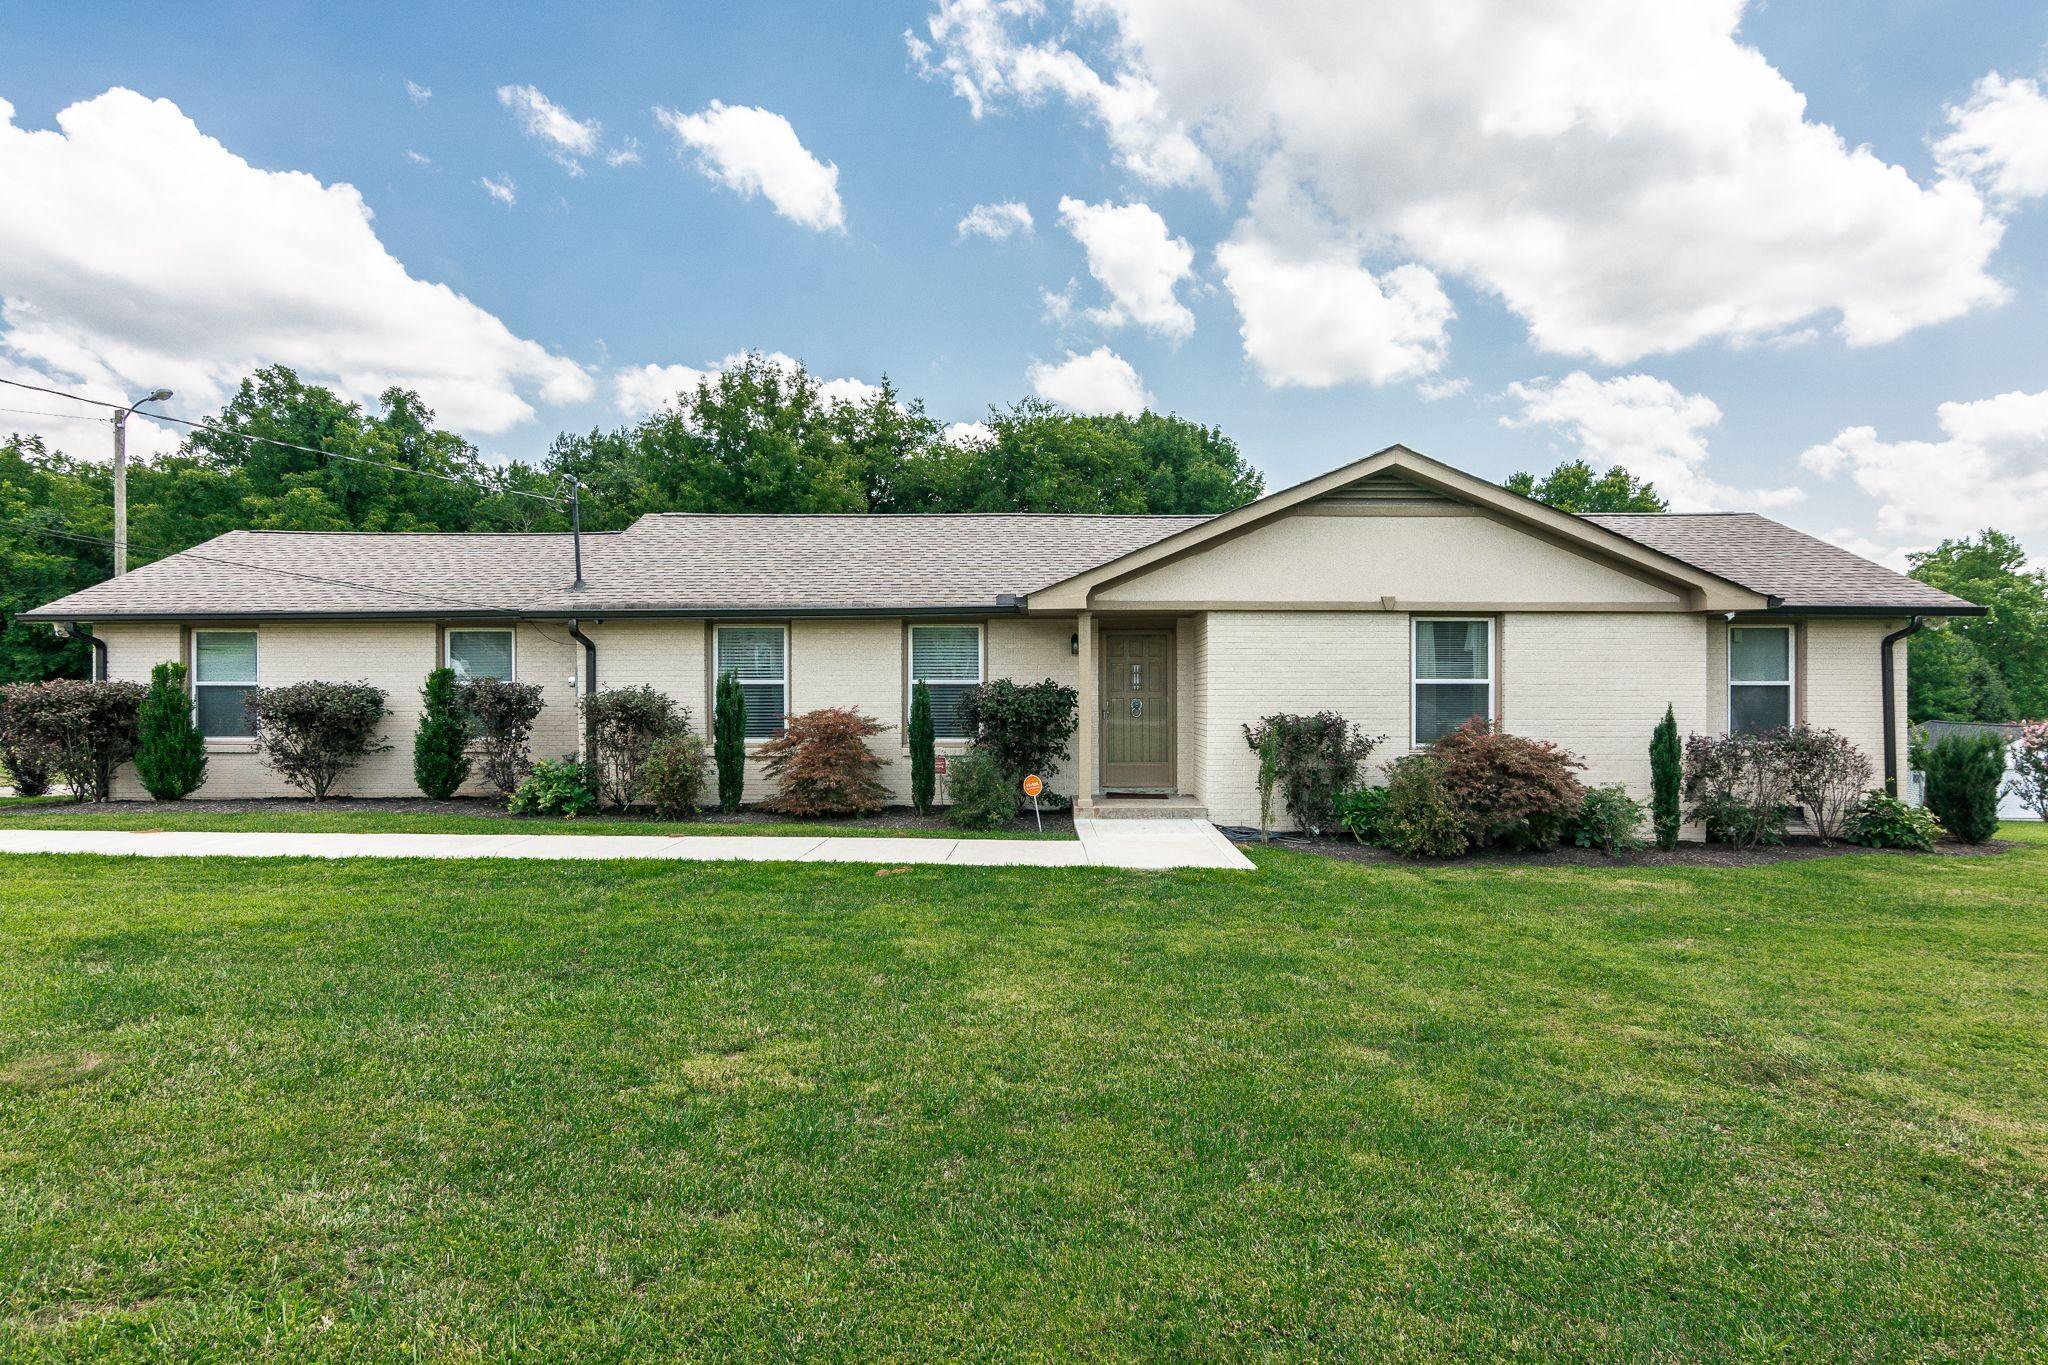 2105 Paula Dr Property Photo - Madison, TN real estate listing